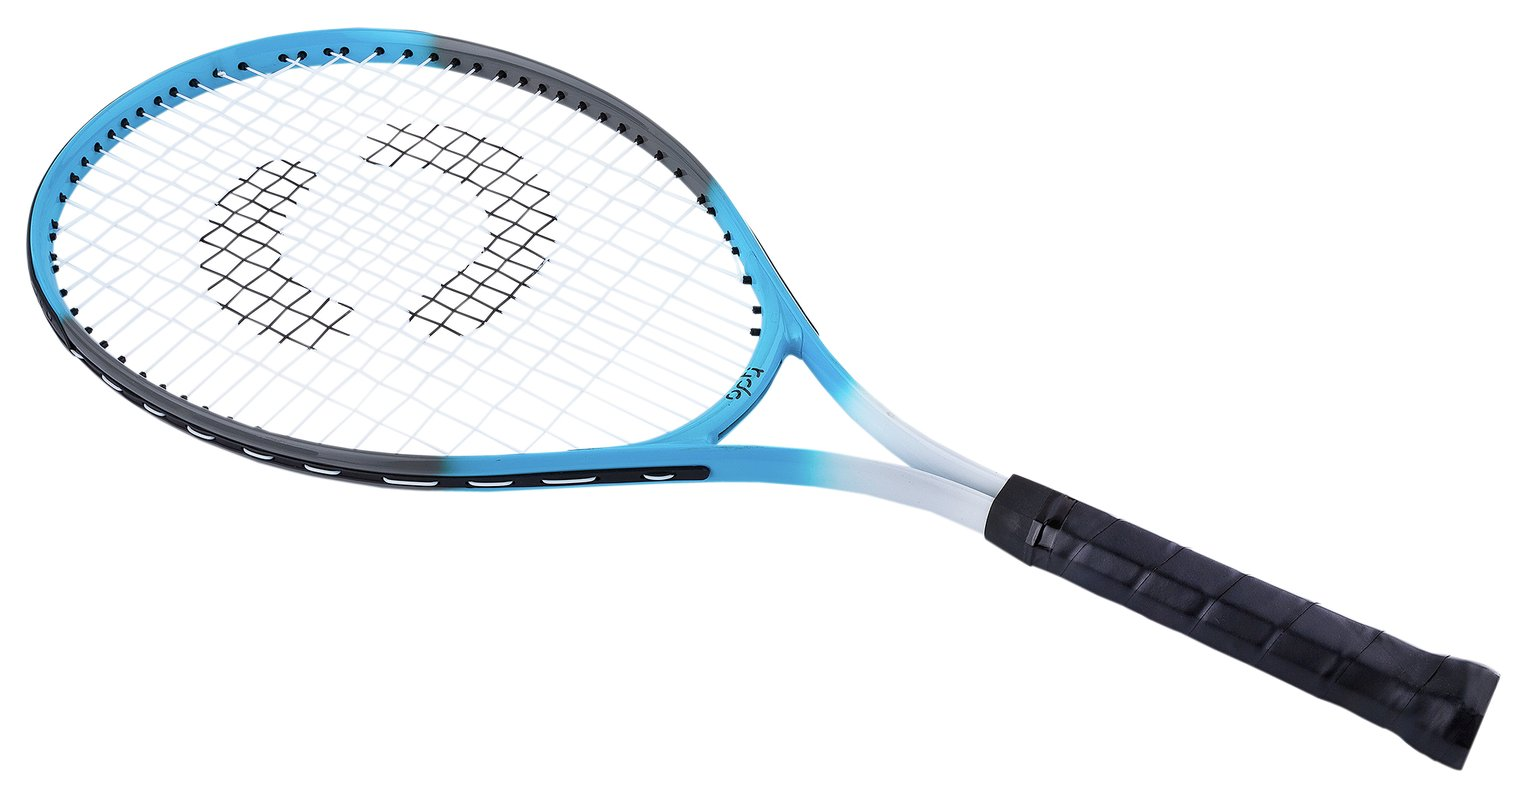 Opti Tennis Racket - 25 Inch lowest price